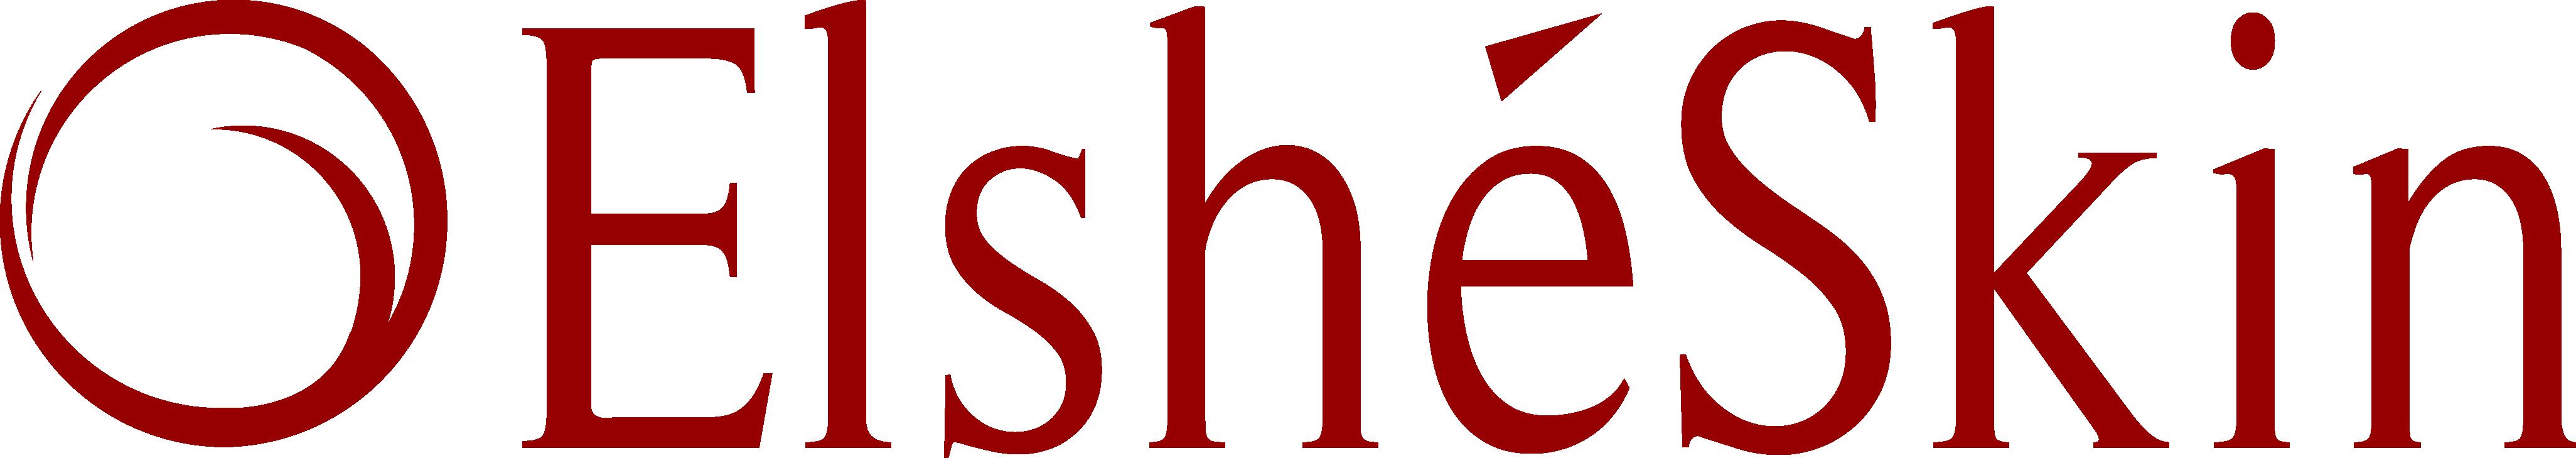 Elsh healthy elshskin. Skin clipart beautiful skin